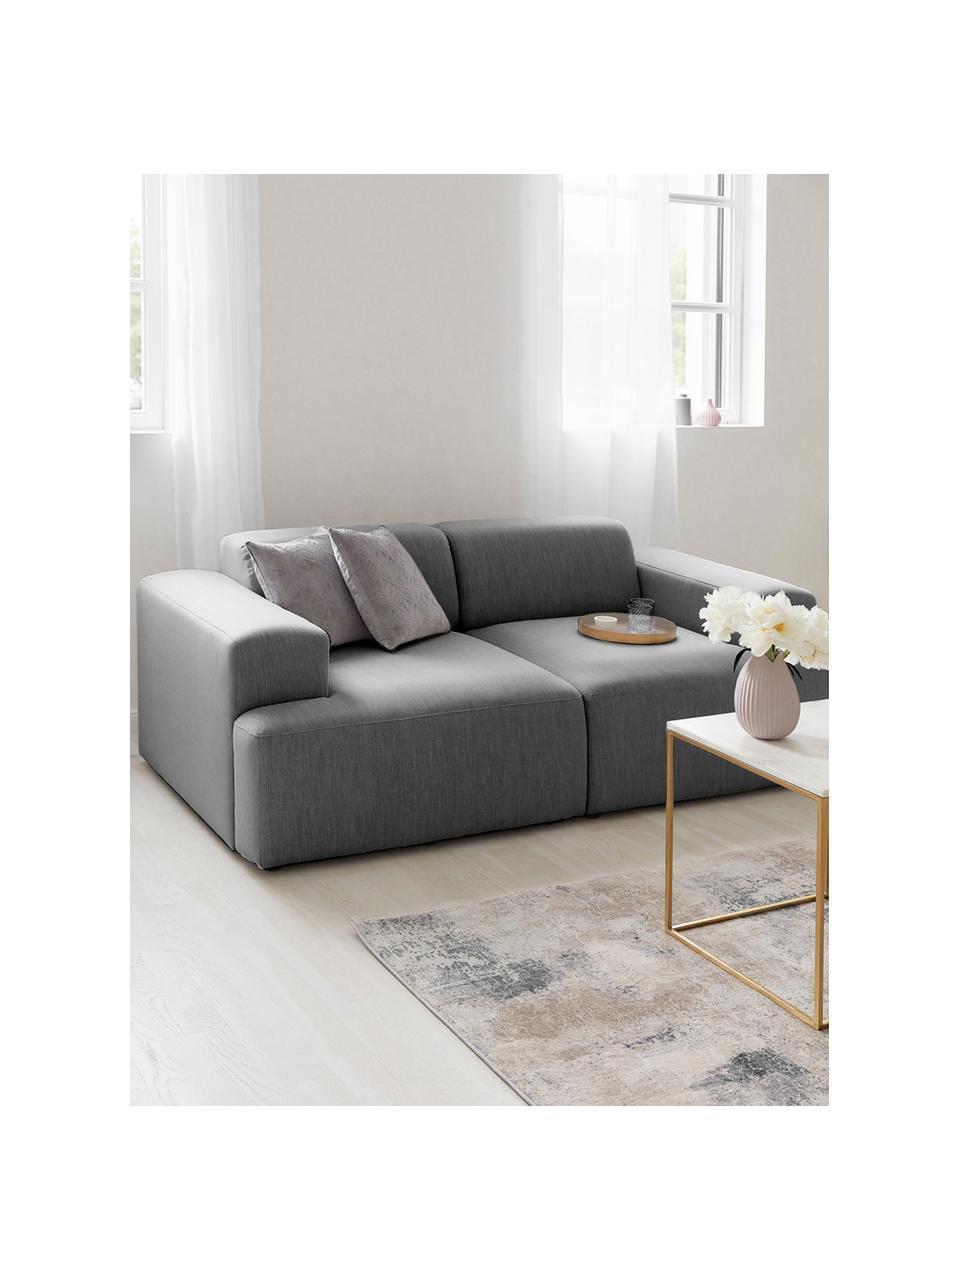 Sofa Melva (2-Sitzer) in Grau, Bezug: 100% Polyester Der hochwe, Gestell: Massives Kiefernholz, FSC, Füße: Kunststoff, Webstoff Grau, B 198 x T 101 cm